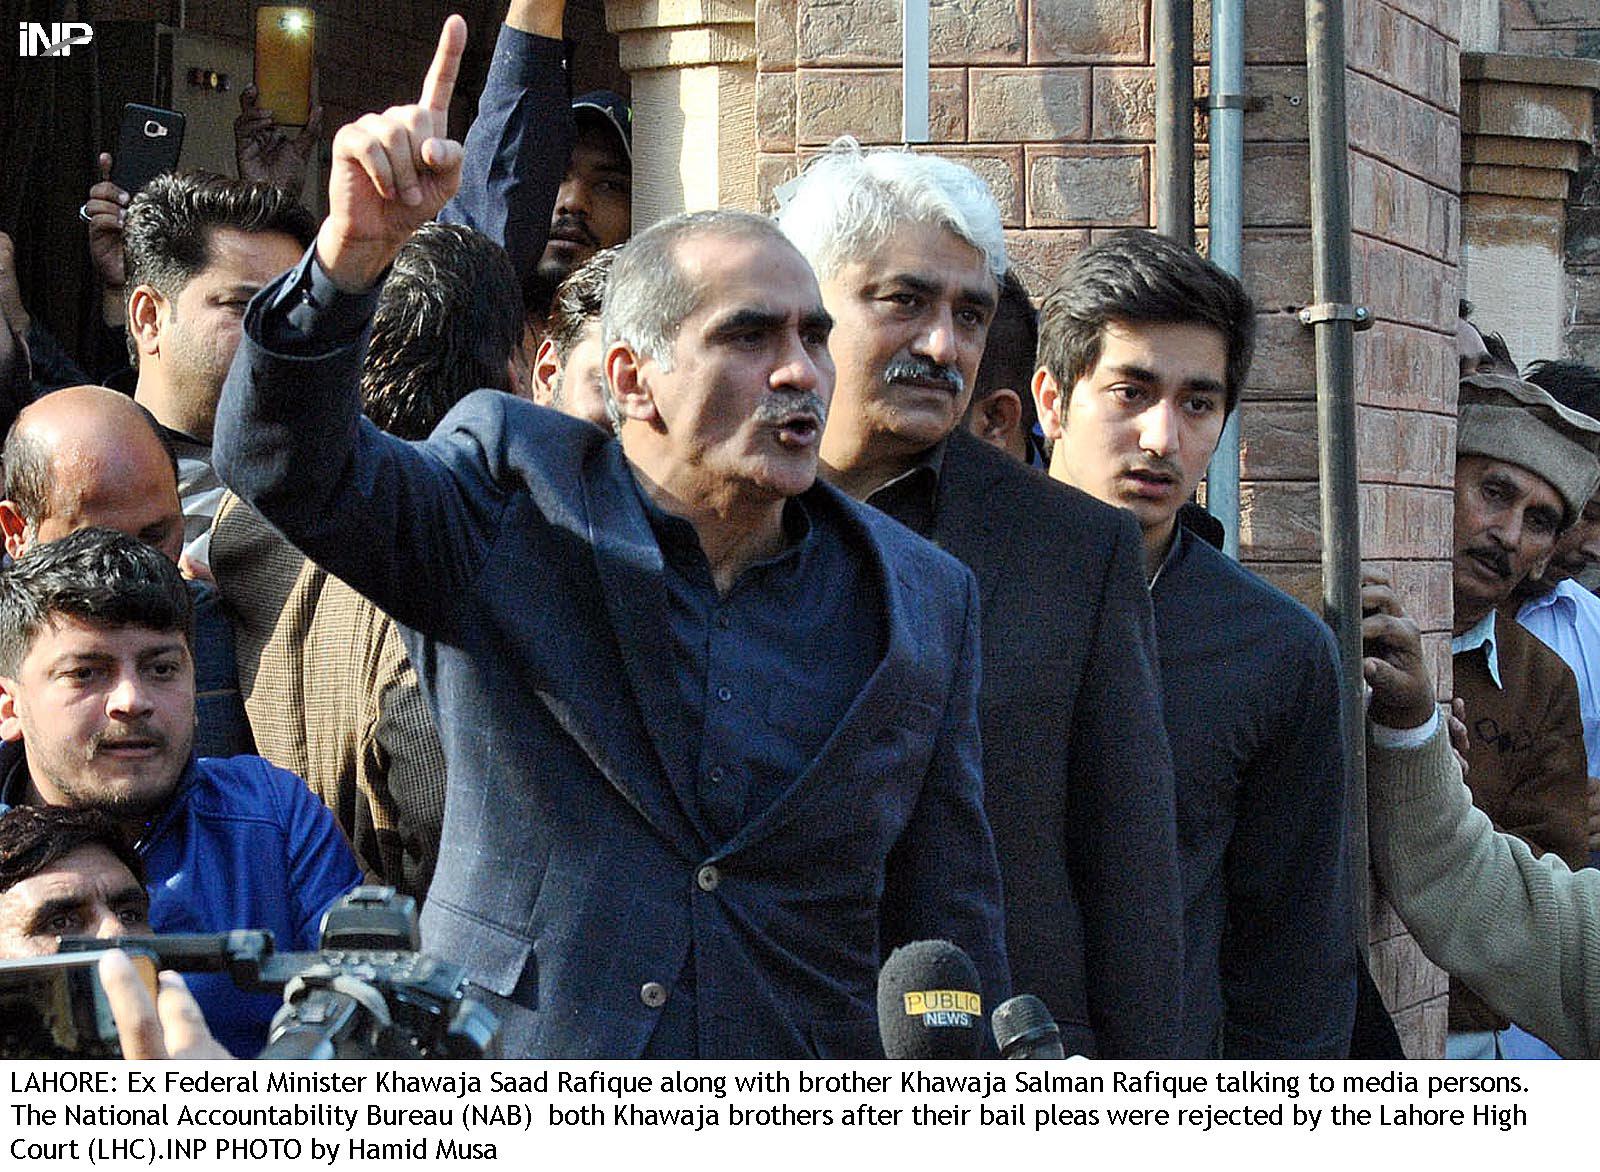 khawaja saad rafique challenges railway officials stats